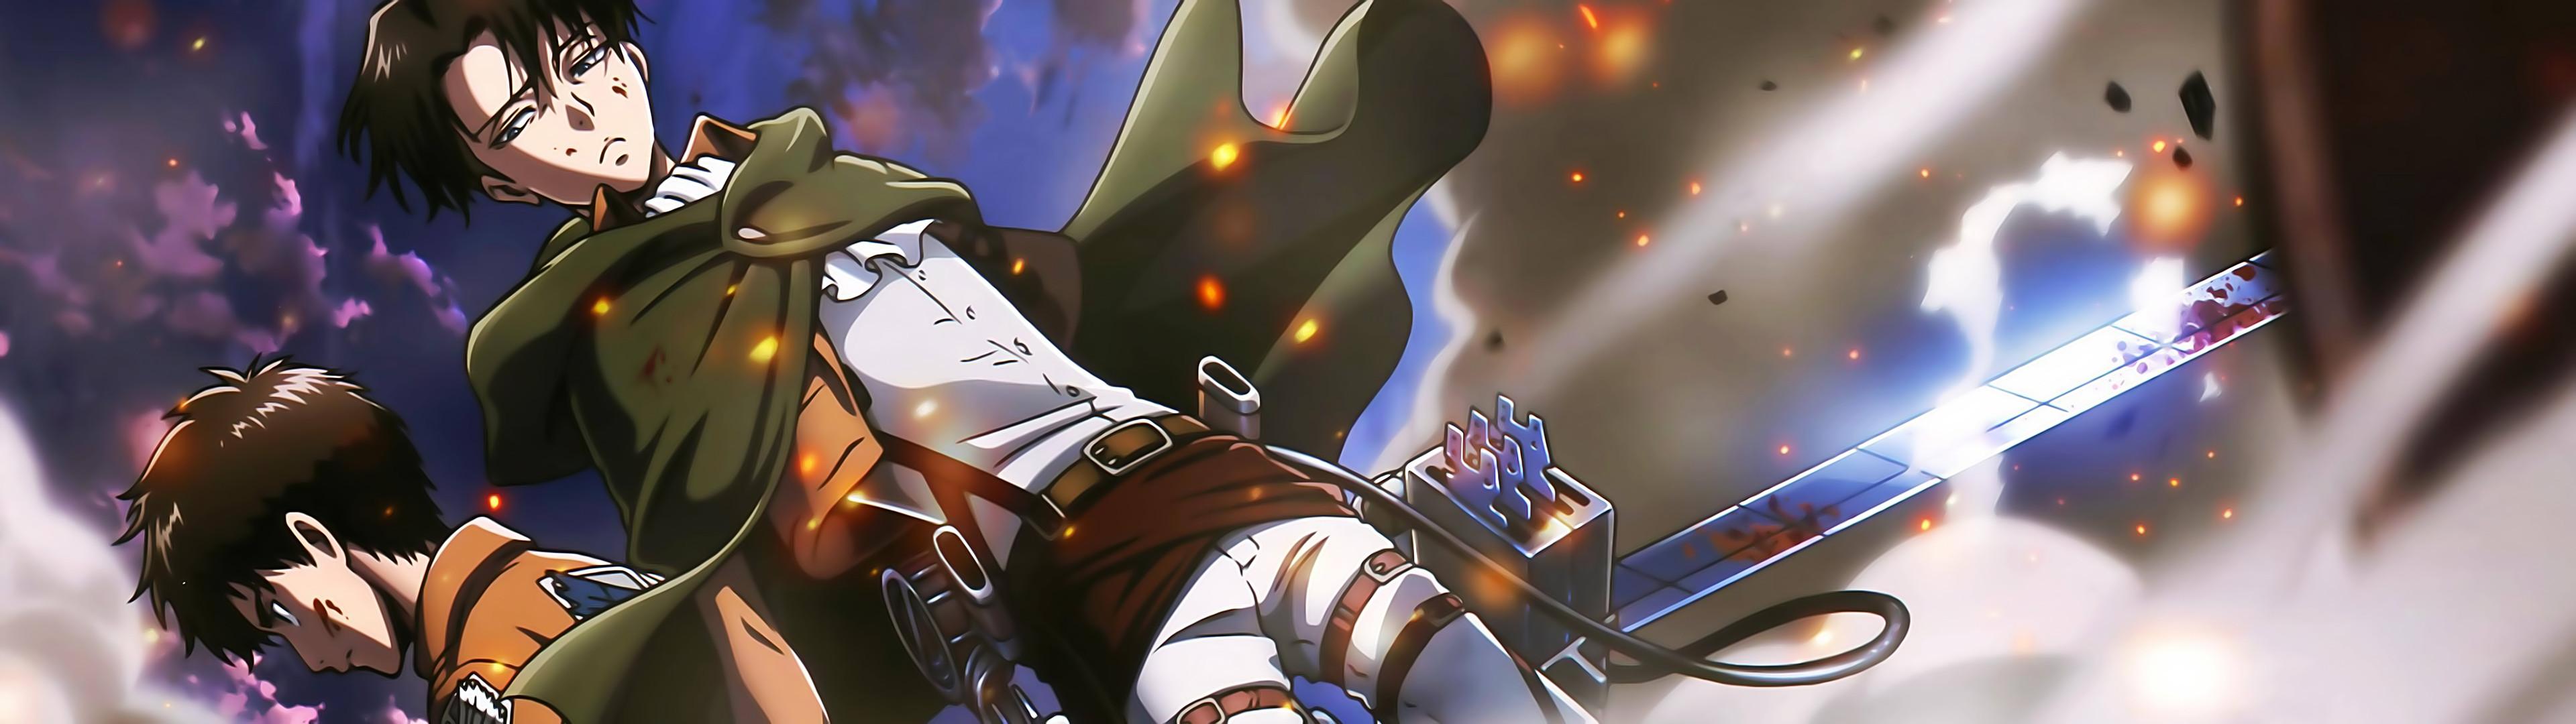 Anime – Attack On Titan Eren Yeager Levi Ackerman Wallpaper